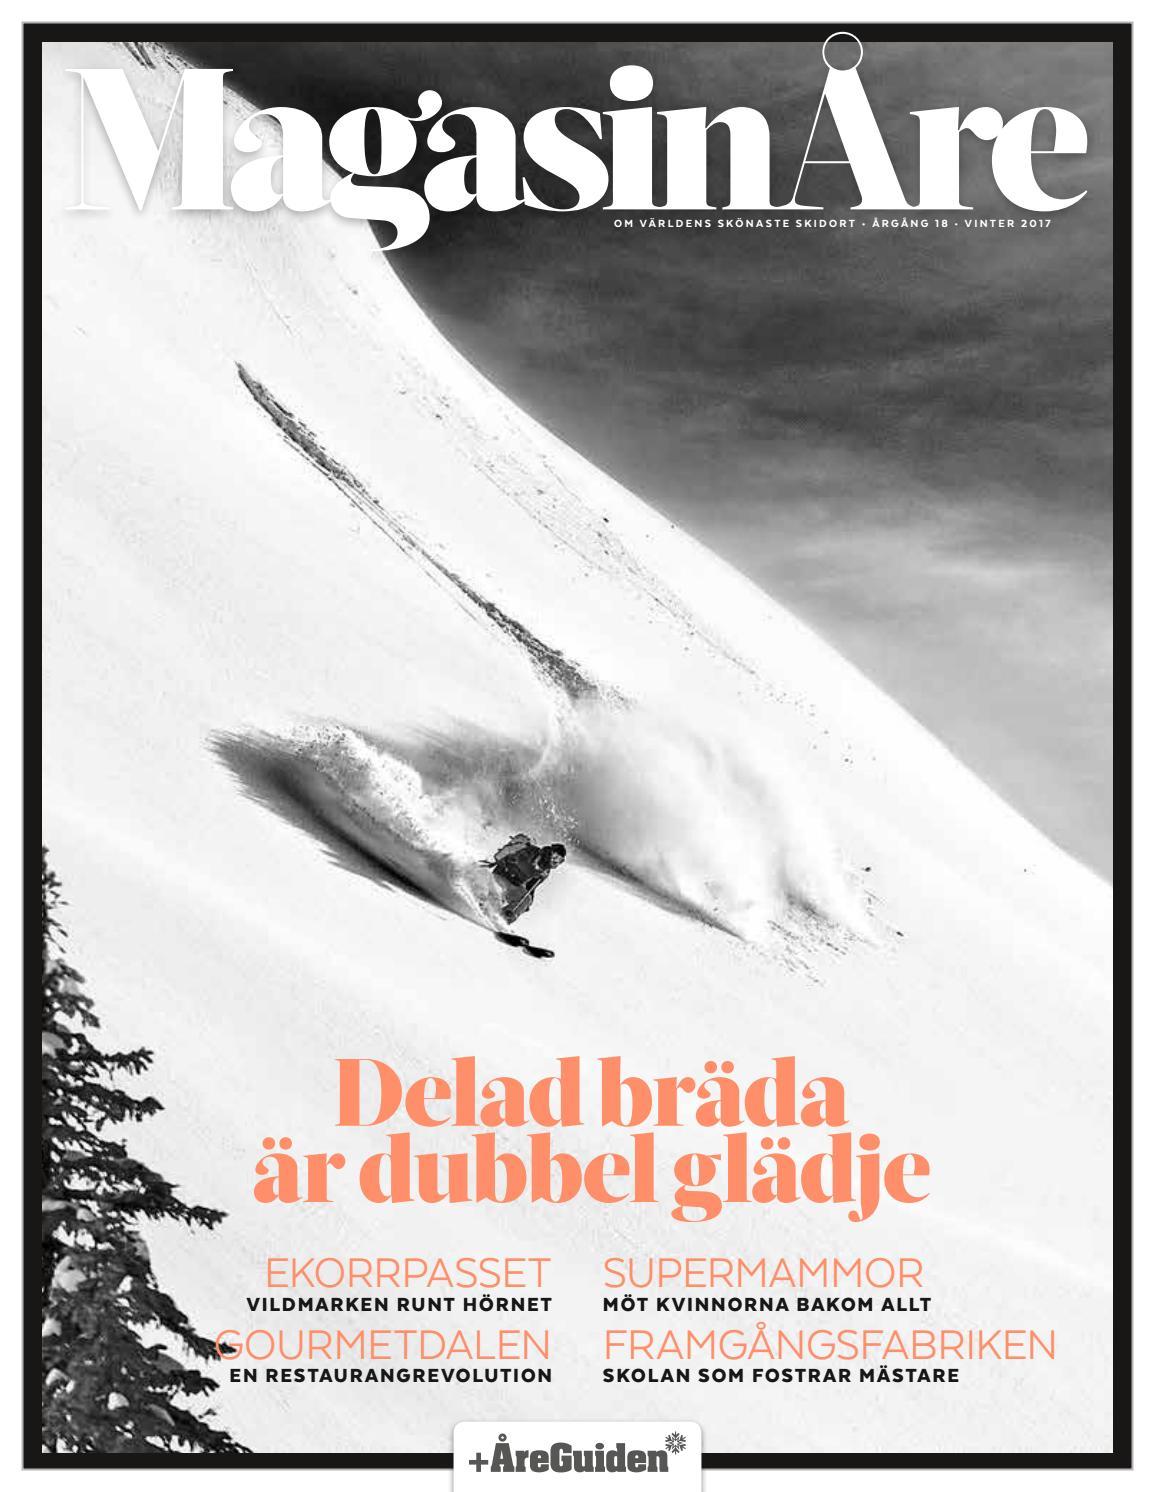 150 skidakare satt fast i kabinbana